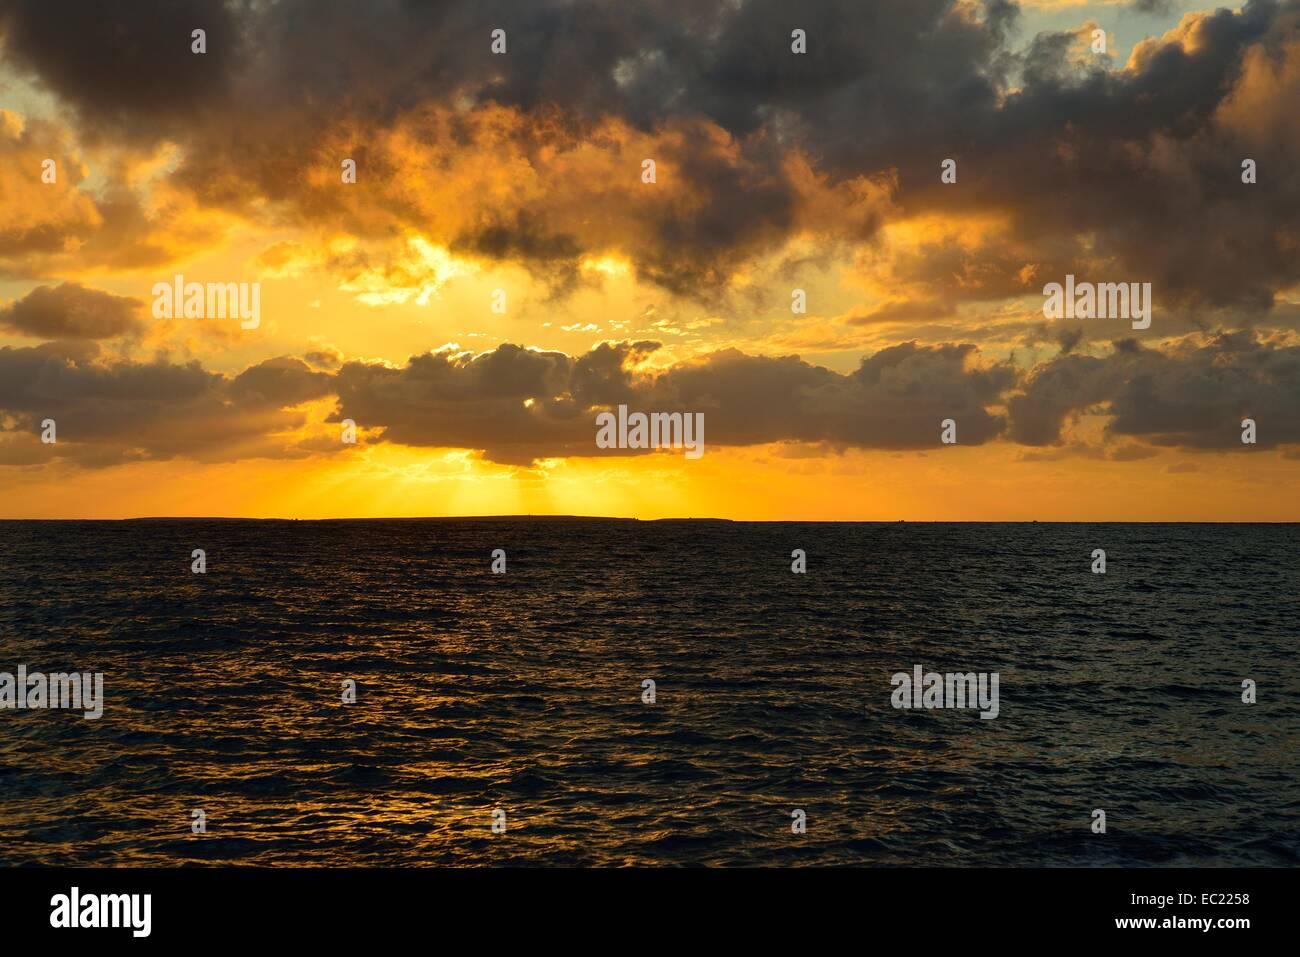 Coucher du soleil en mer de nuages, Mari Ermi, Péninsule de Sinis, Province de Sassari, Sardaigne, Italie, Photo Stock